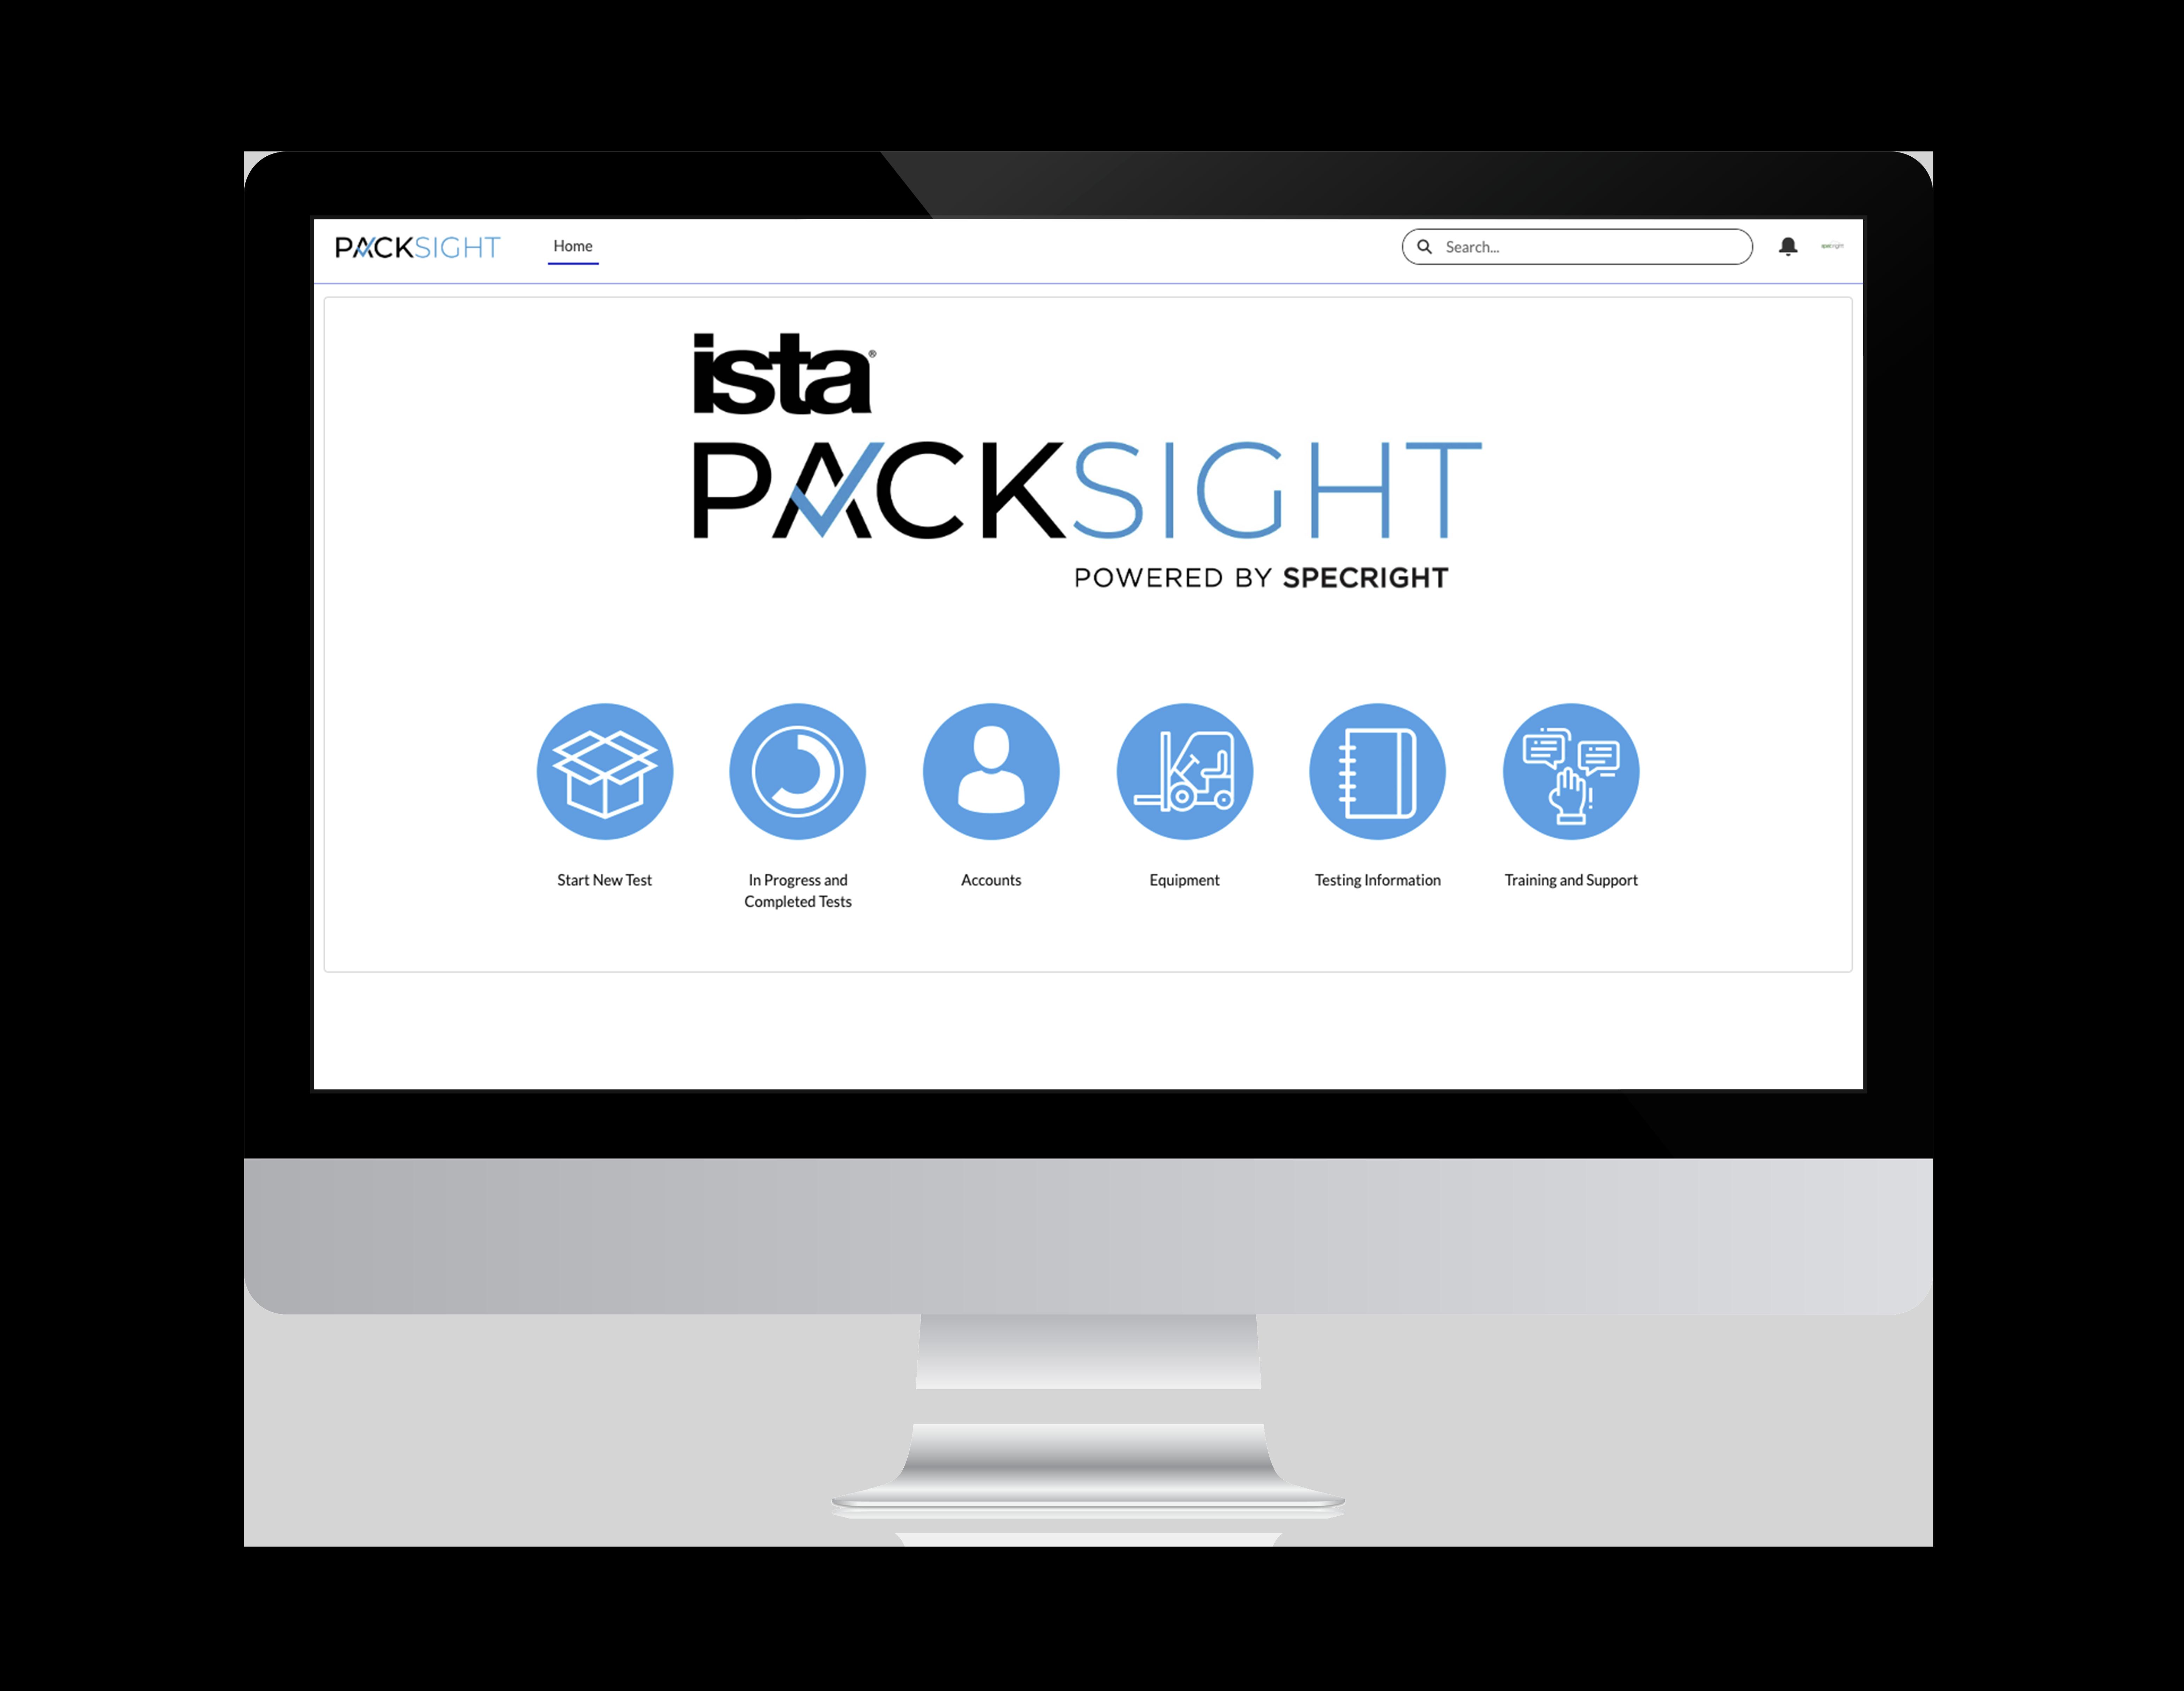 Ista PackSight Monitor